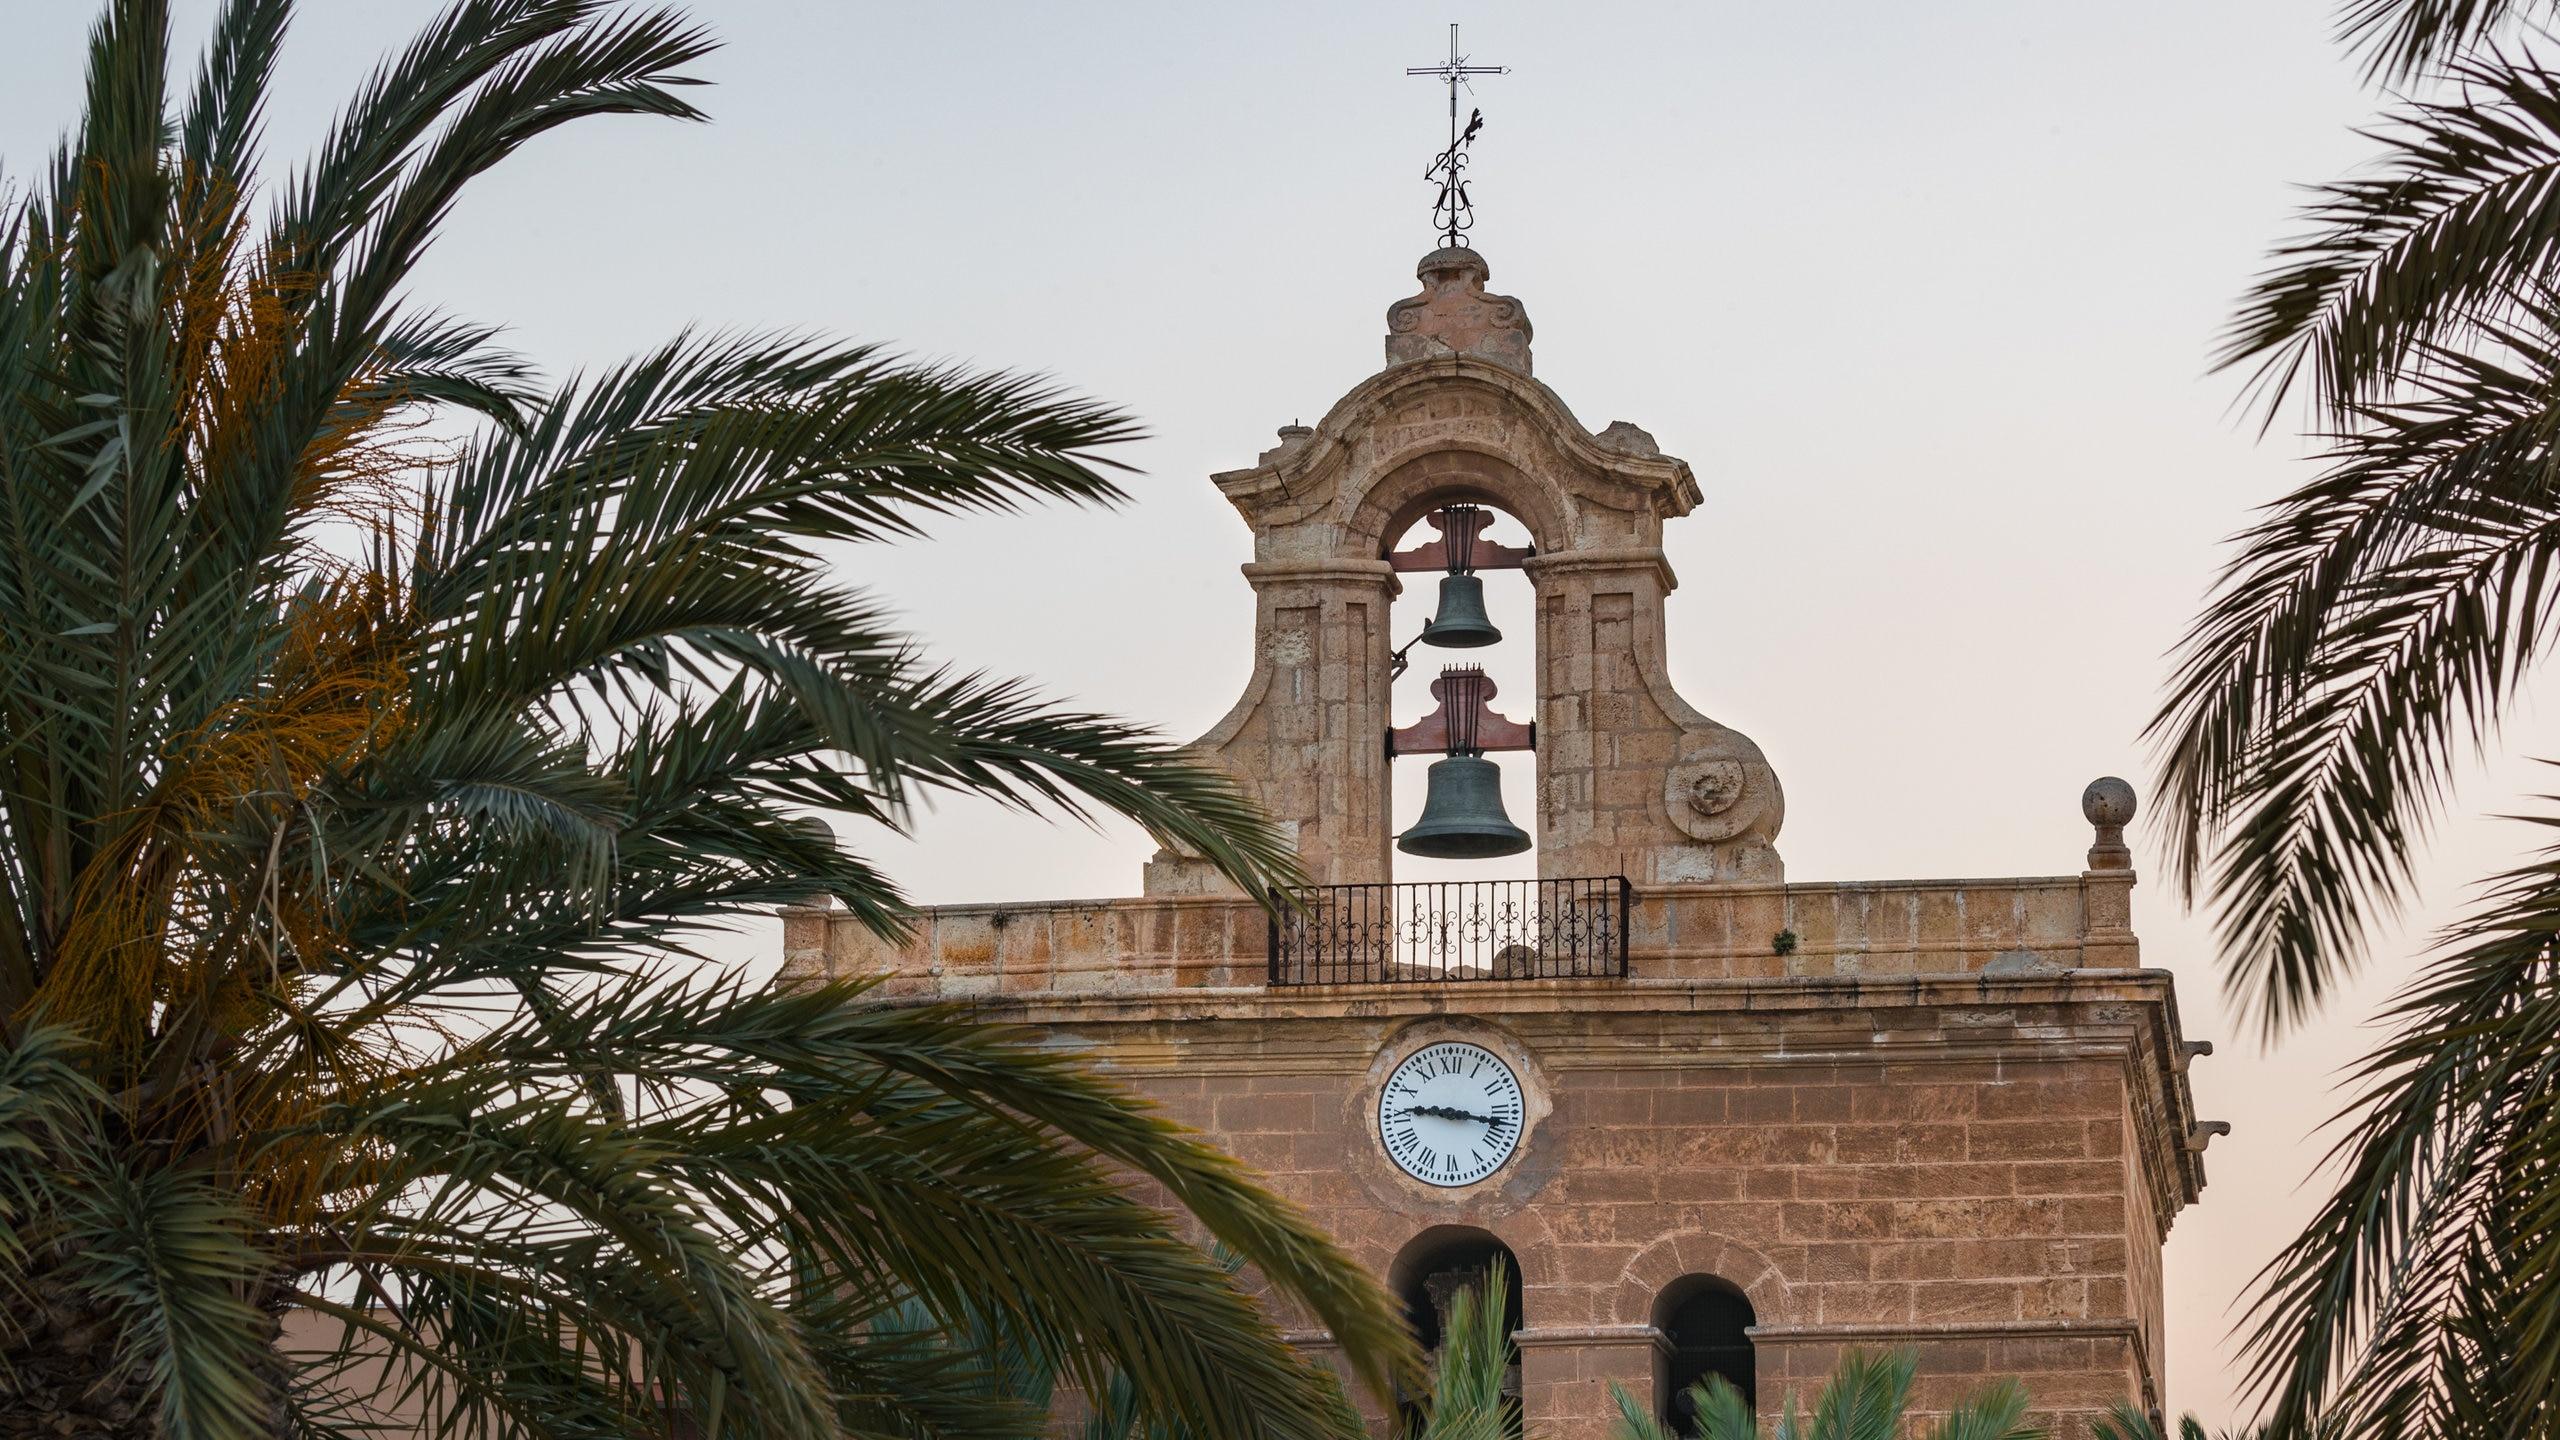 Almería Centro, Almeria, Andalusia, Spain